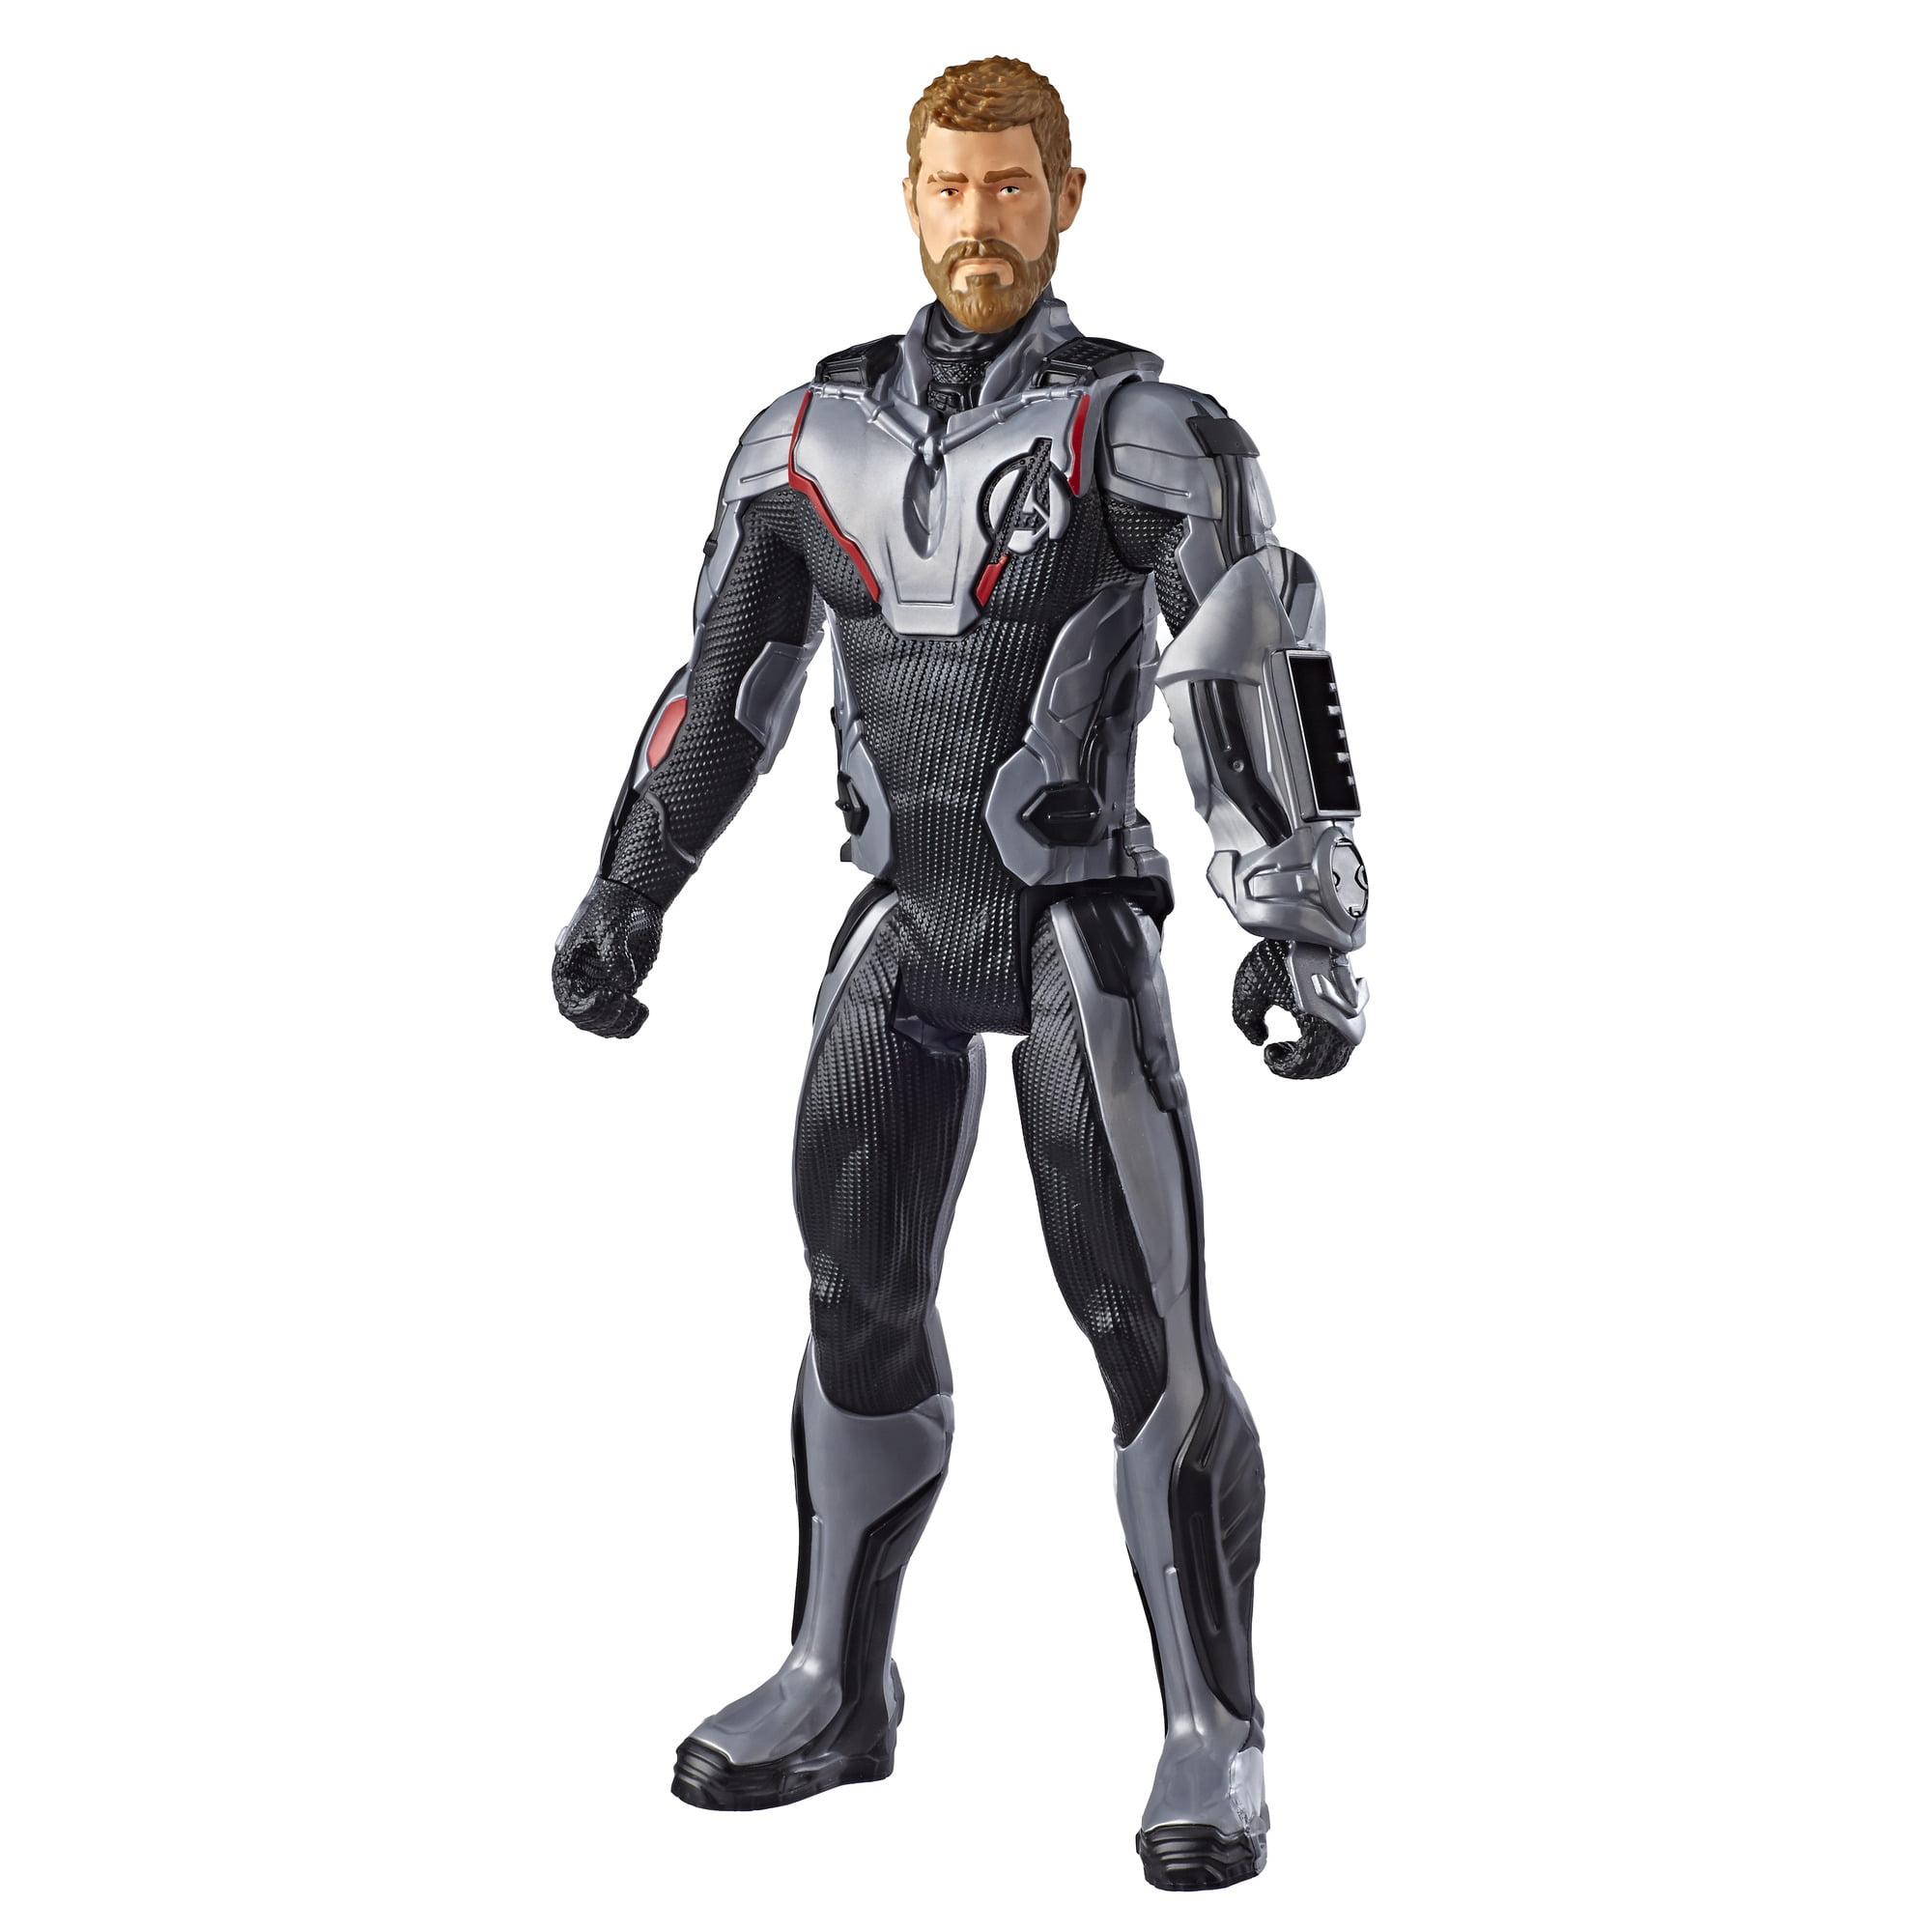 Marvel Titan Hero Series Exclusive 20 Figure Set Cake Decoration Toy for Boys